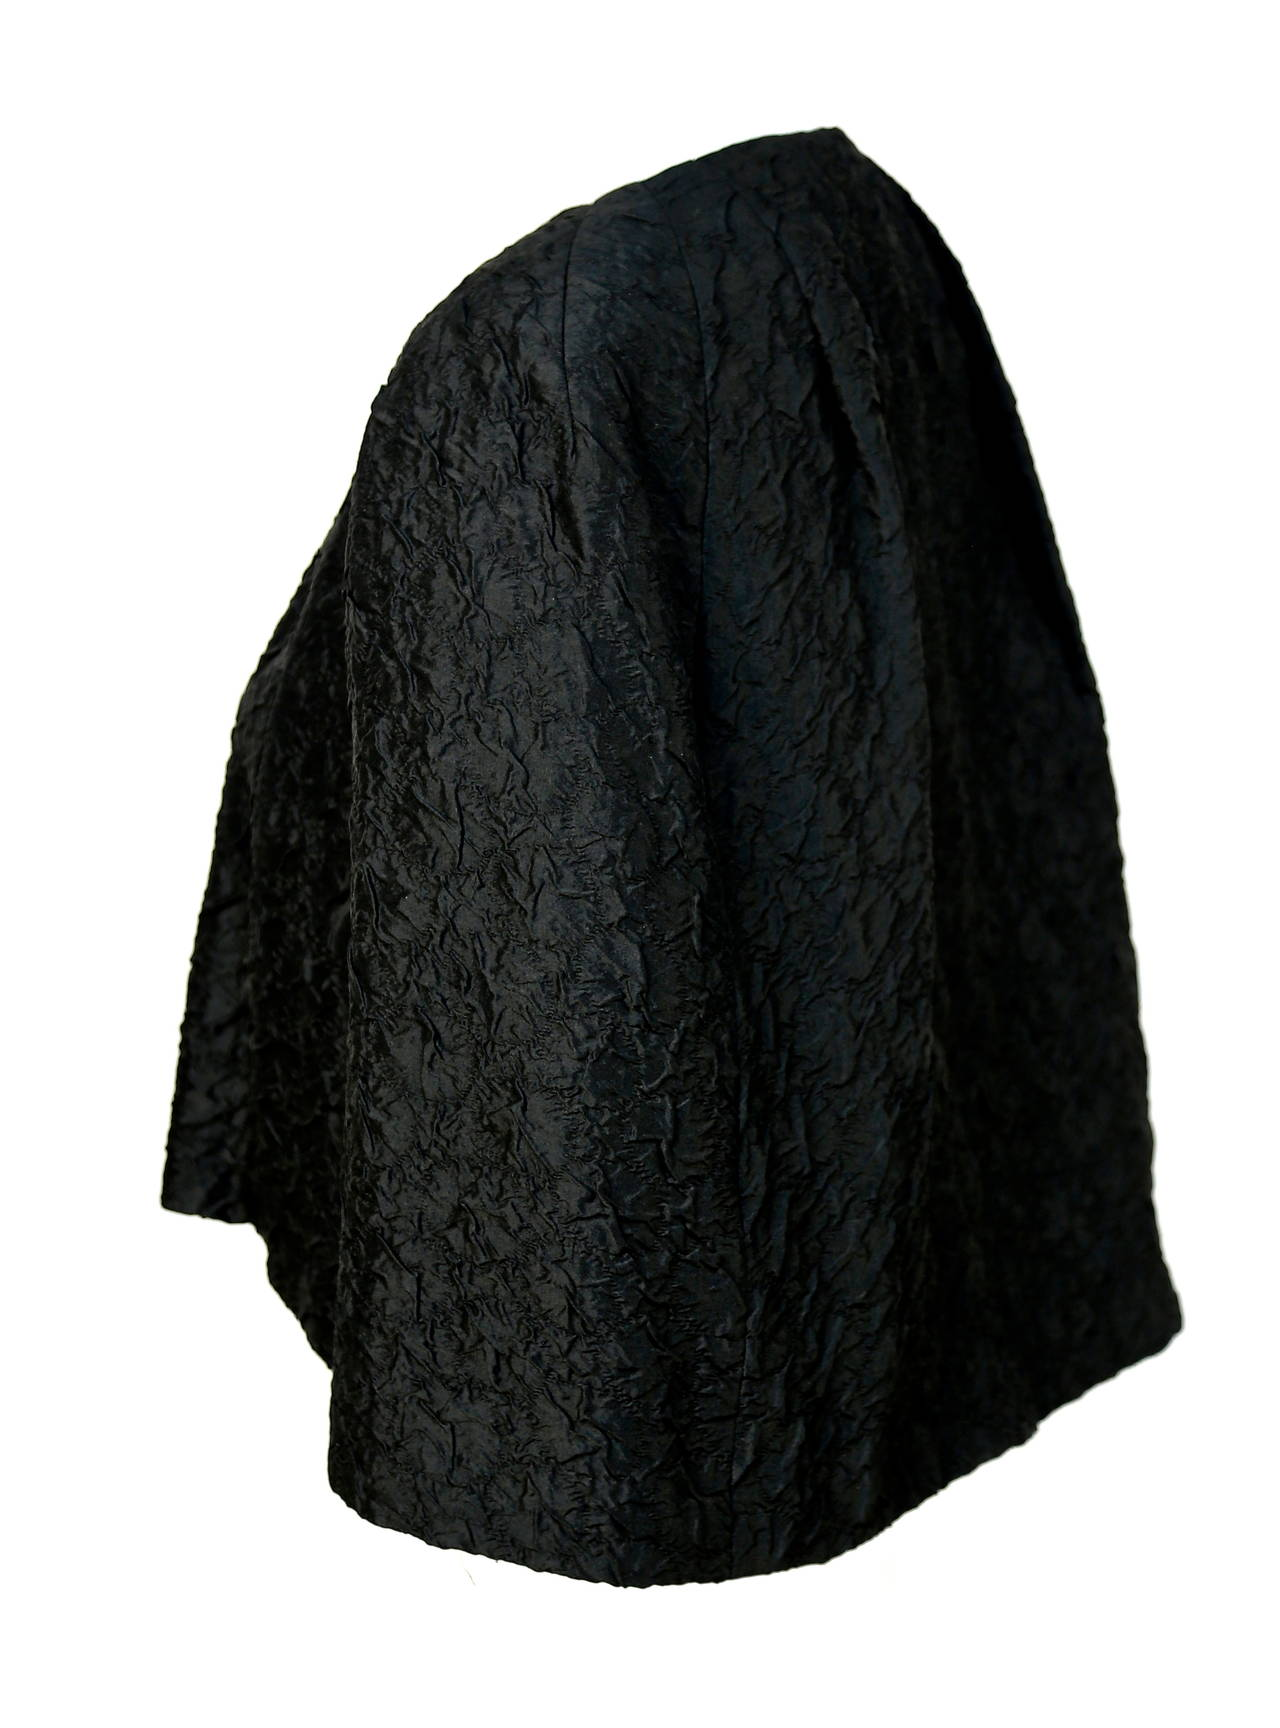 1960's CRISTOBAL BALENCIAGA EISA haute couture black silk capelet 2